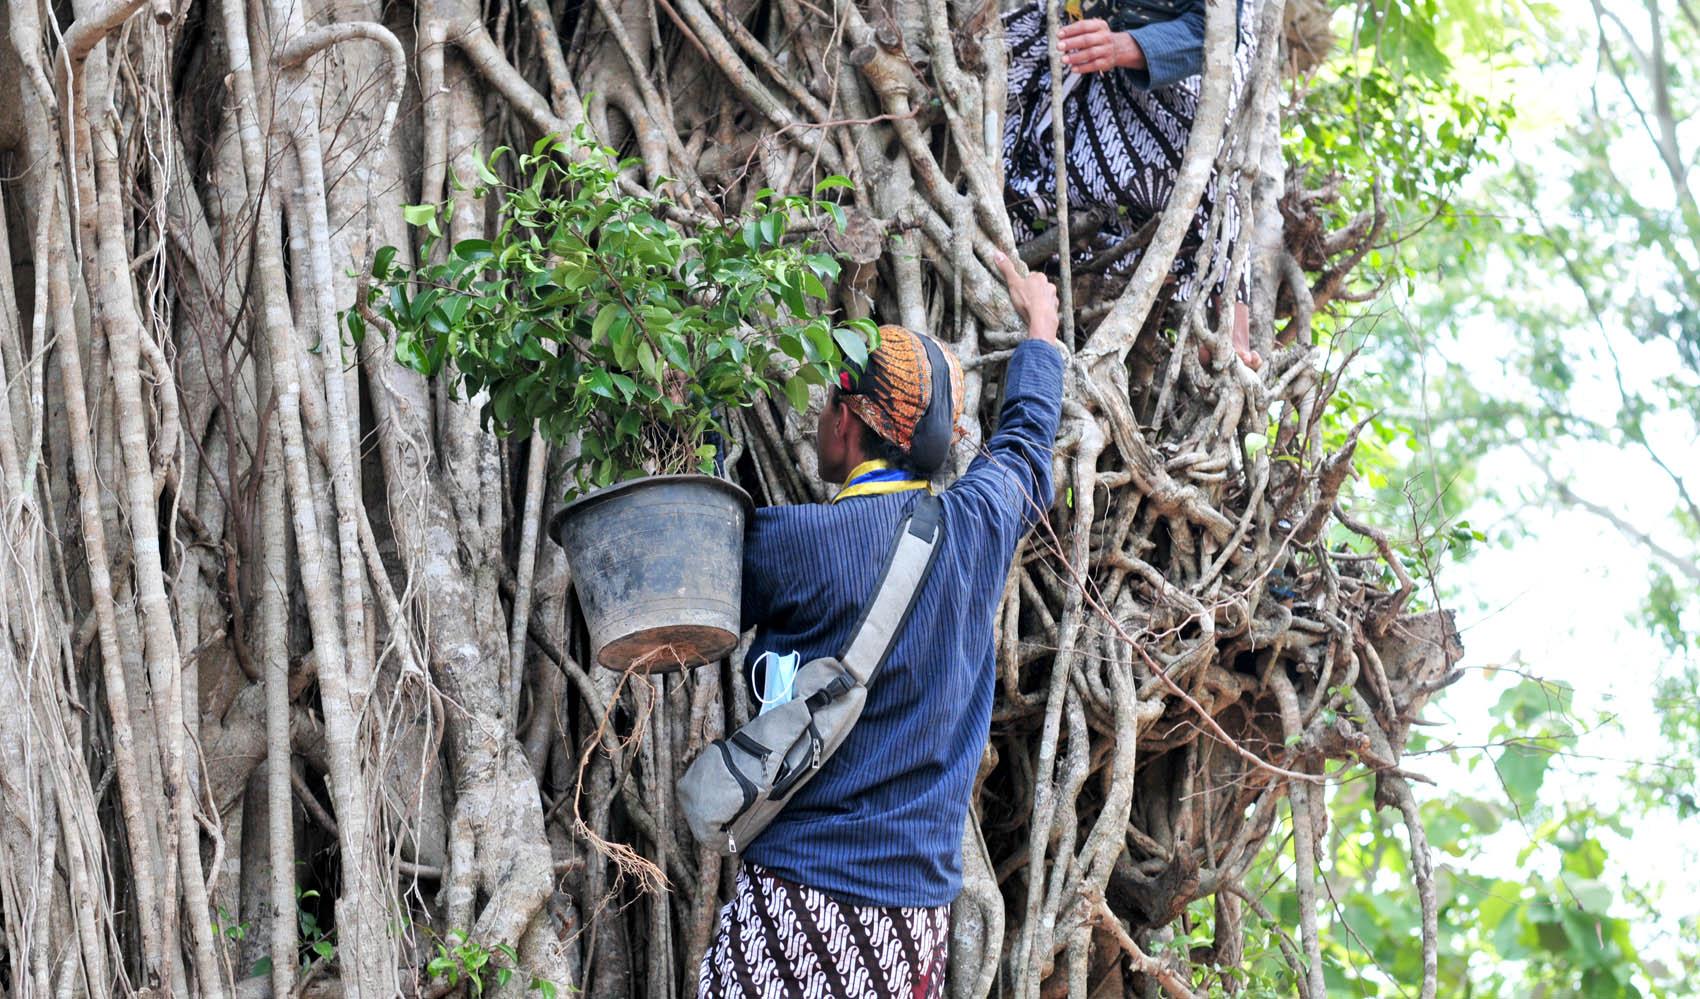 Prosesi penyulaman beringin pada tubuh resan pohon beringin di Pasar Kawak.[Foto:Padmo]